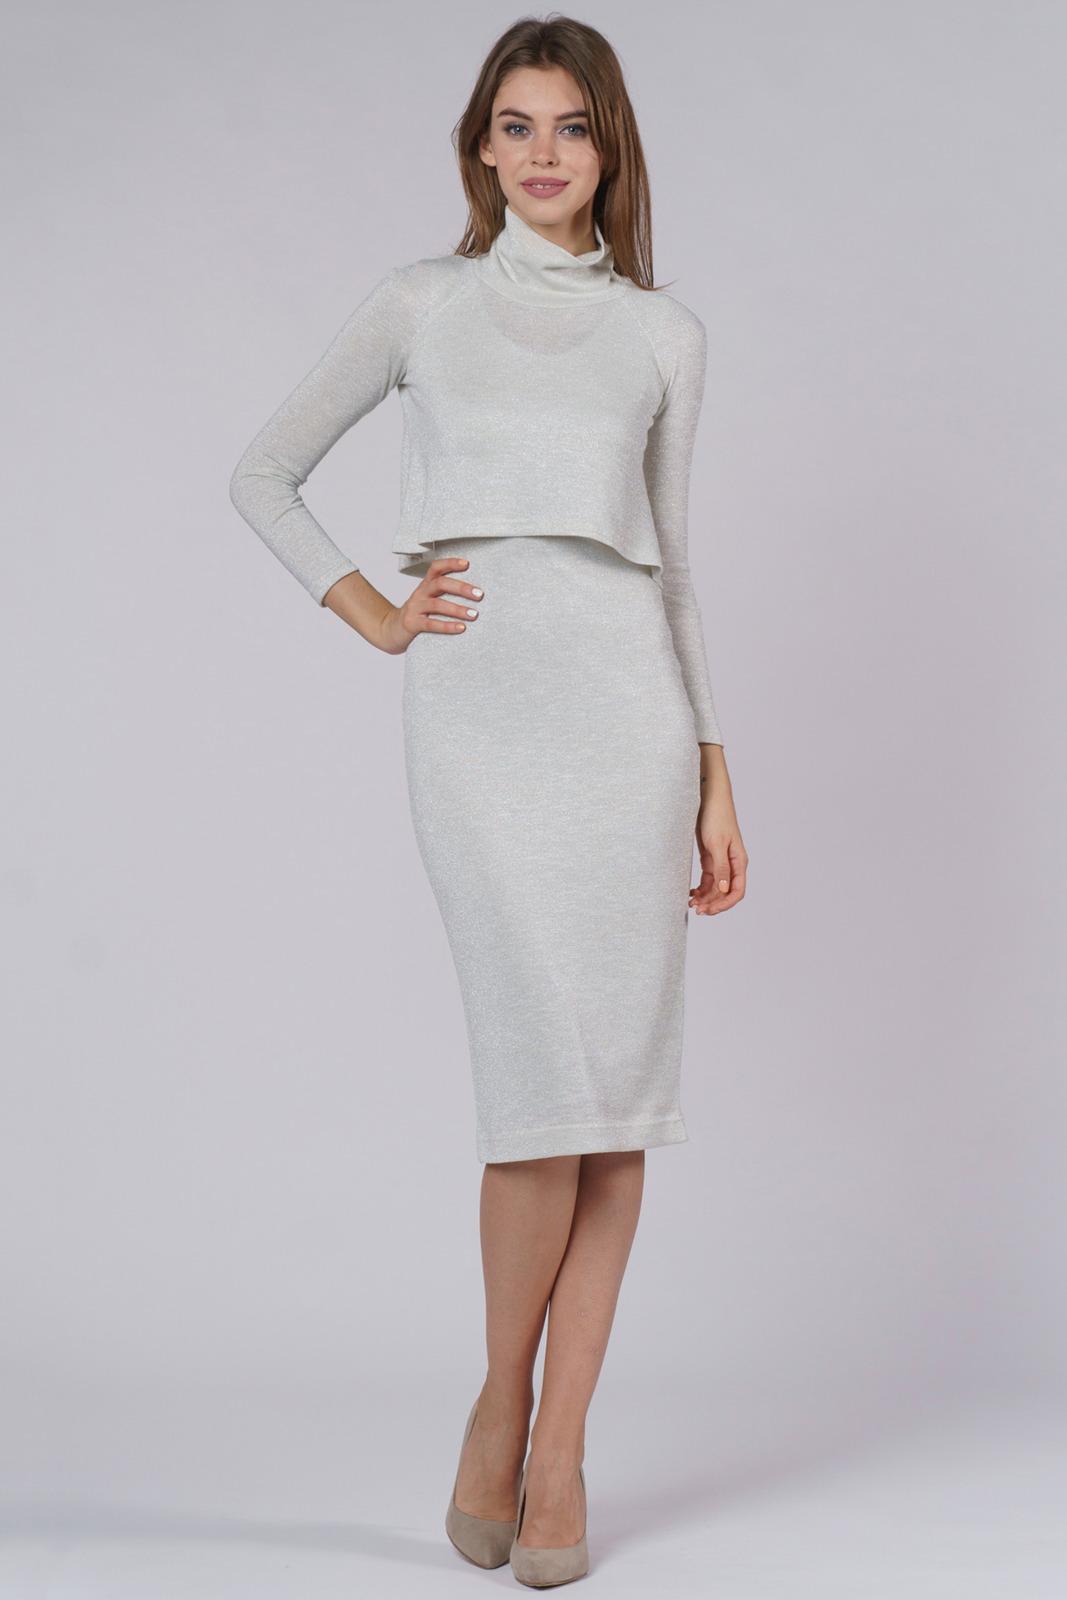 Комплект одежды Evercode george krutienko платья на лето